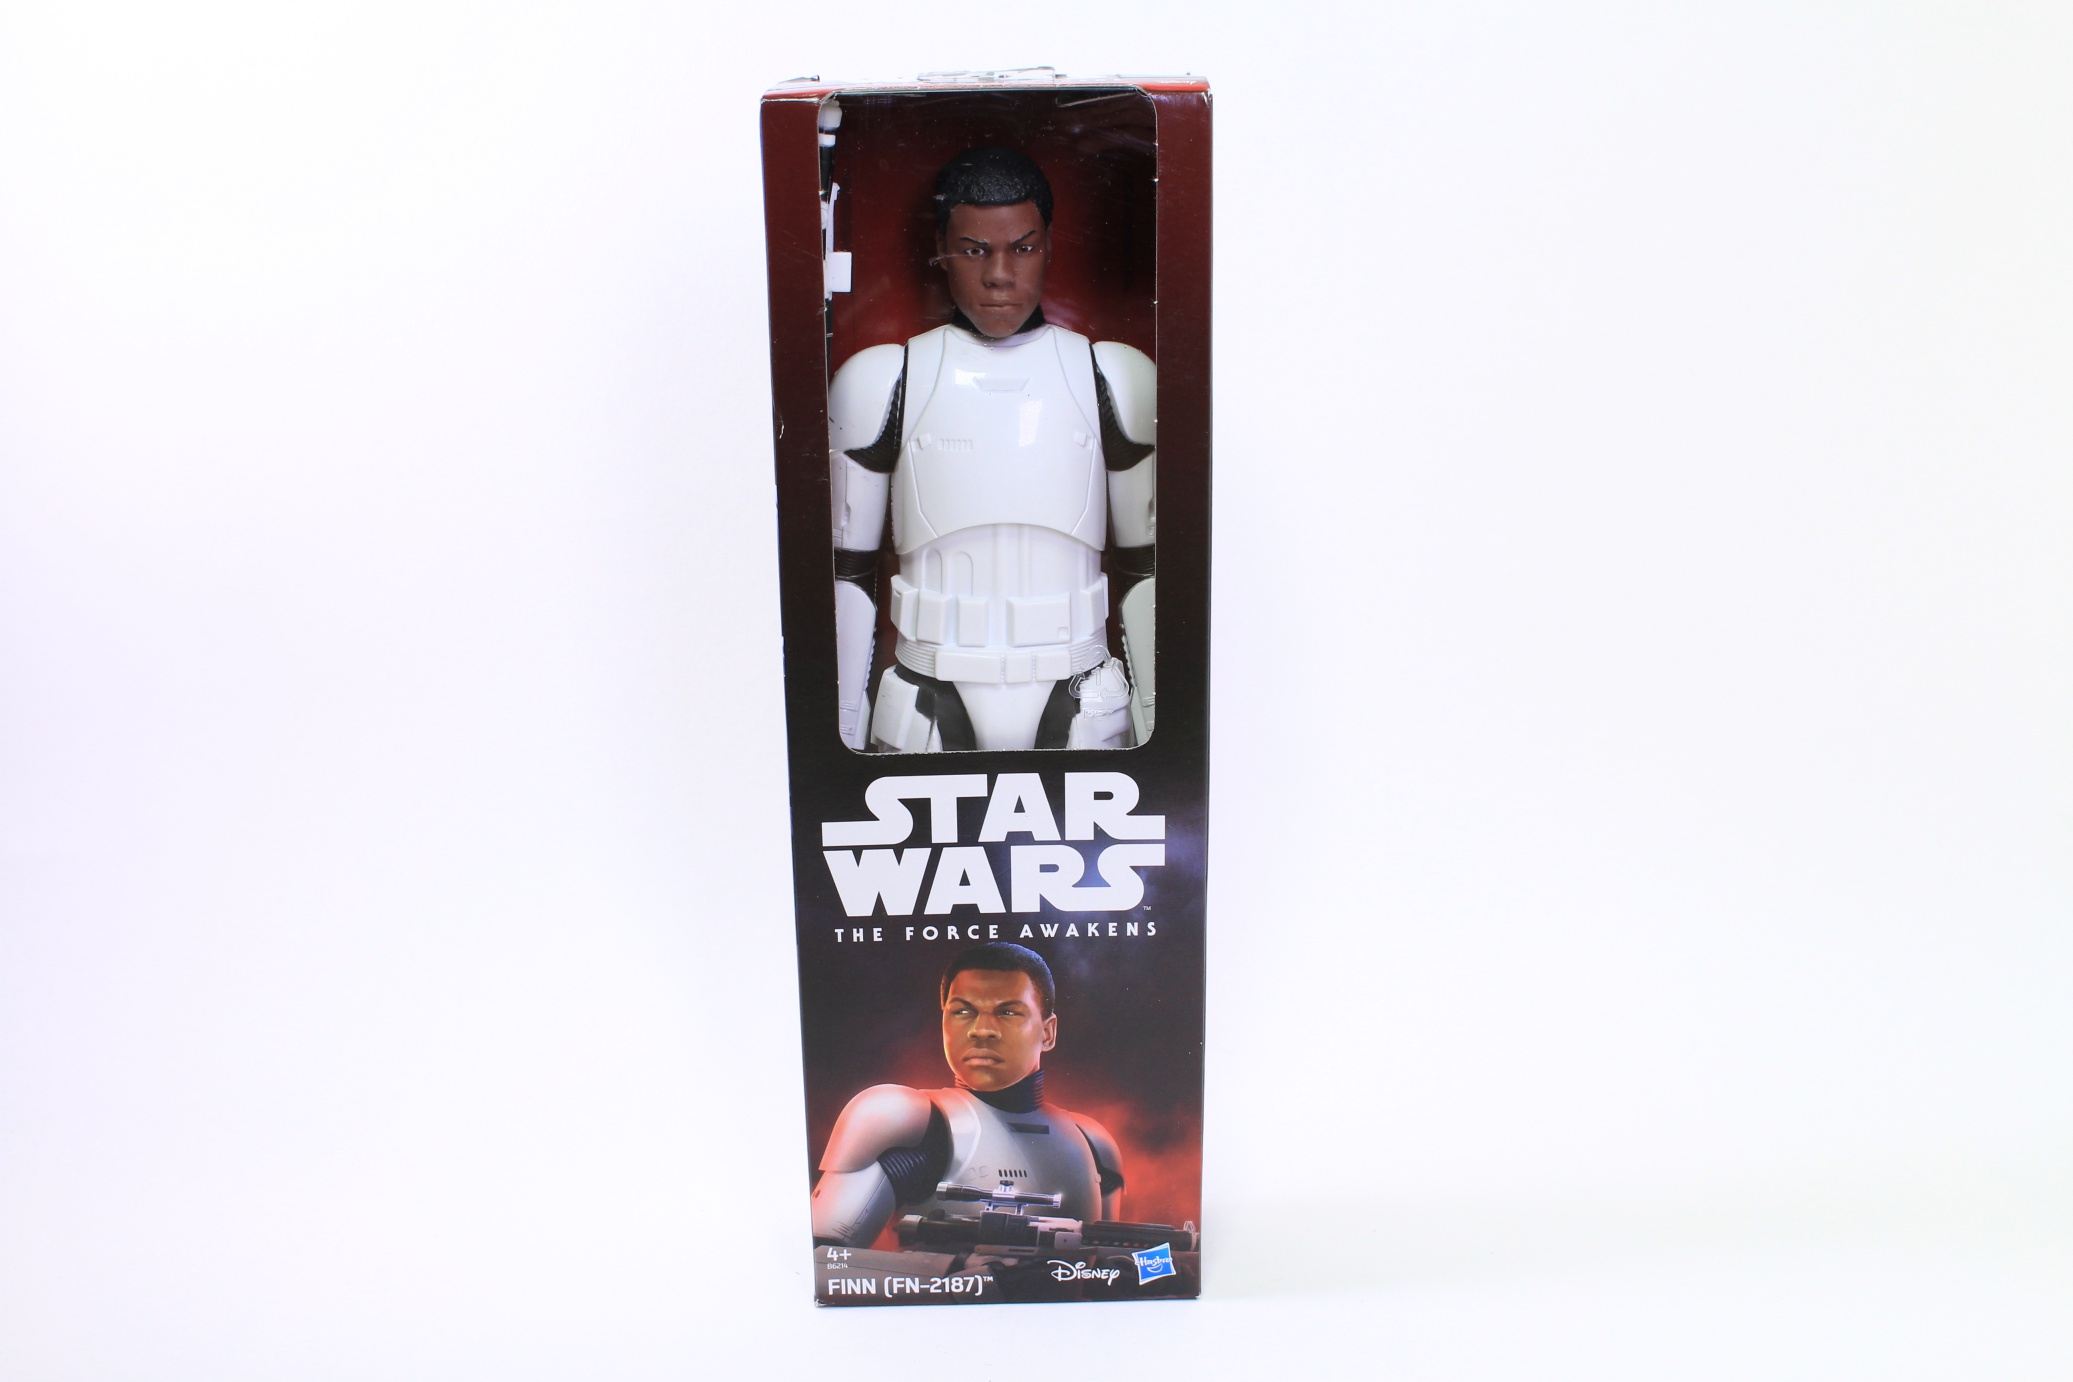 FN-2187 Star Wars Episode VII The Force Awakens New Unopened! Finn Armor Up